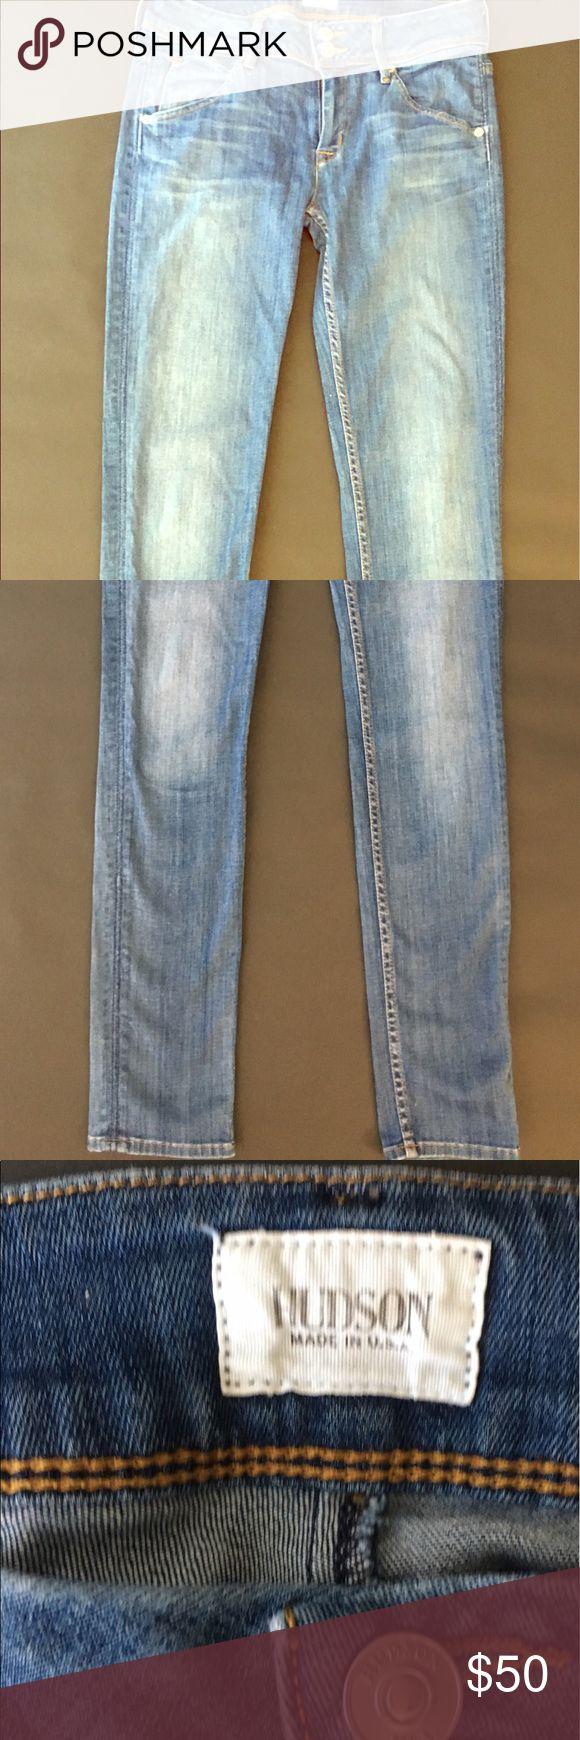 Hudson Denim Hudson Denim Hudson Jeans Jeans Skinny